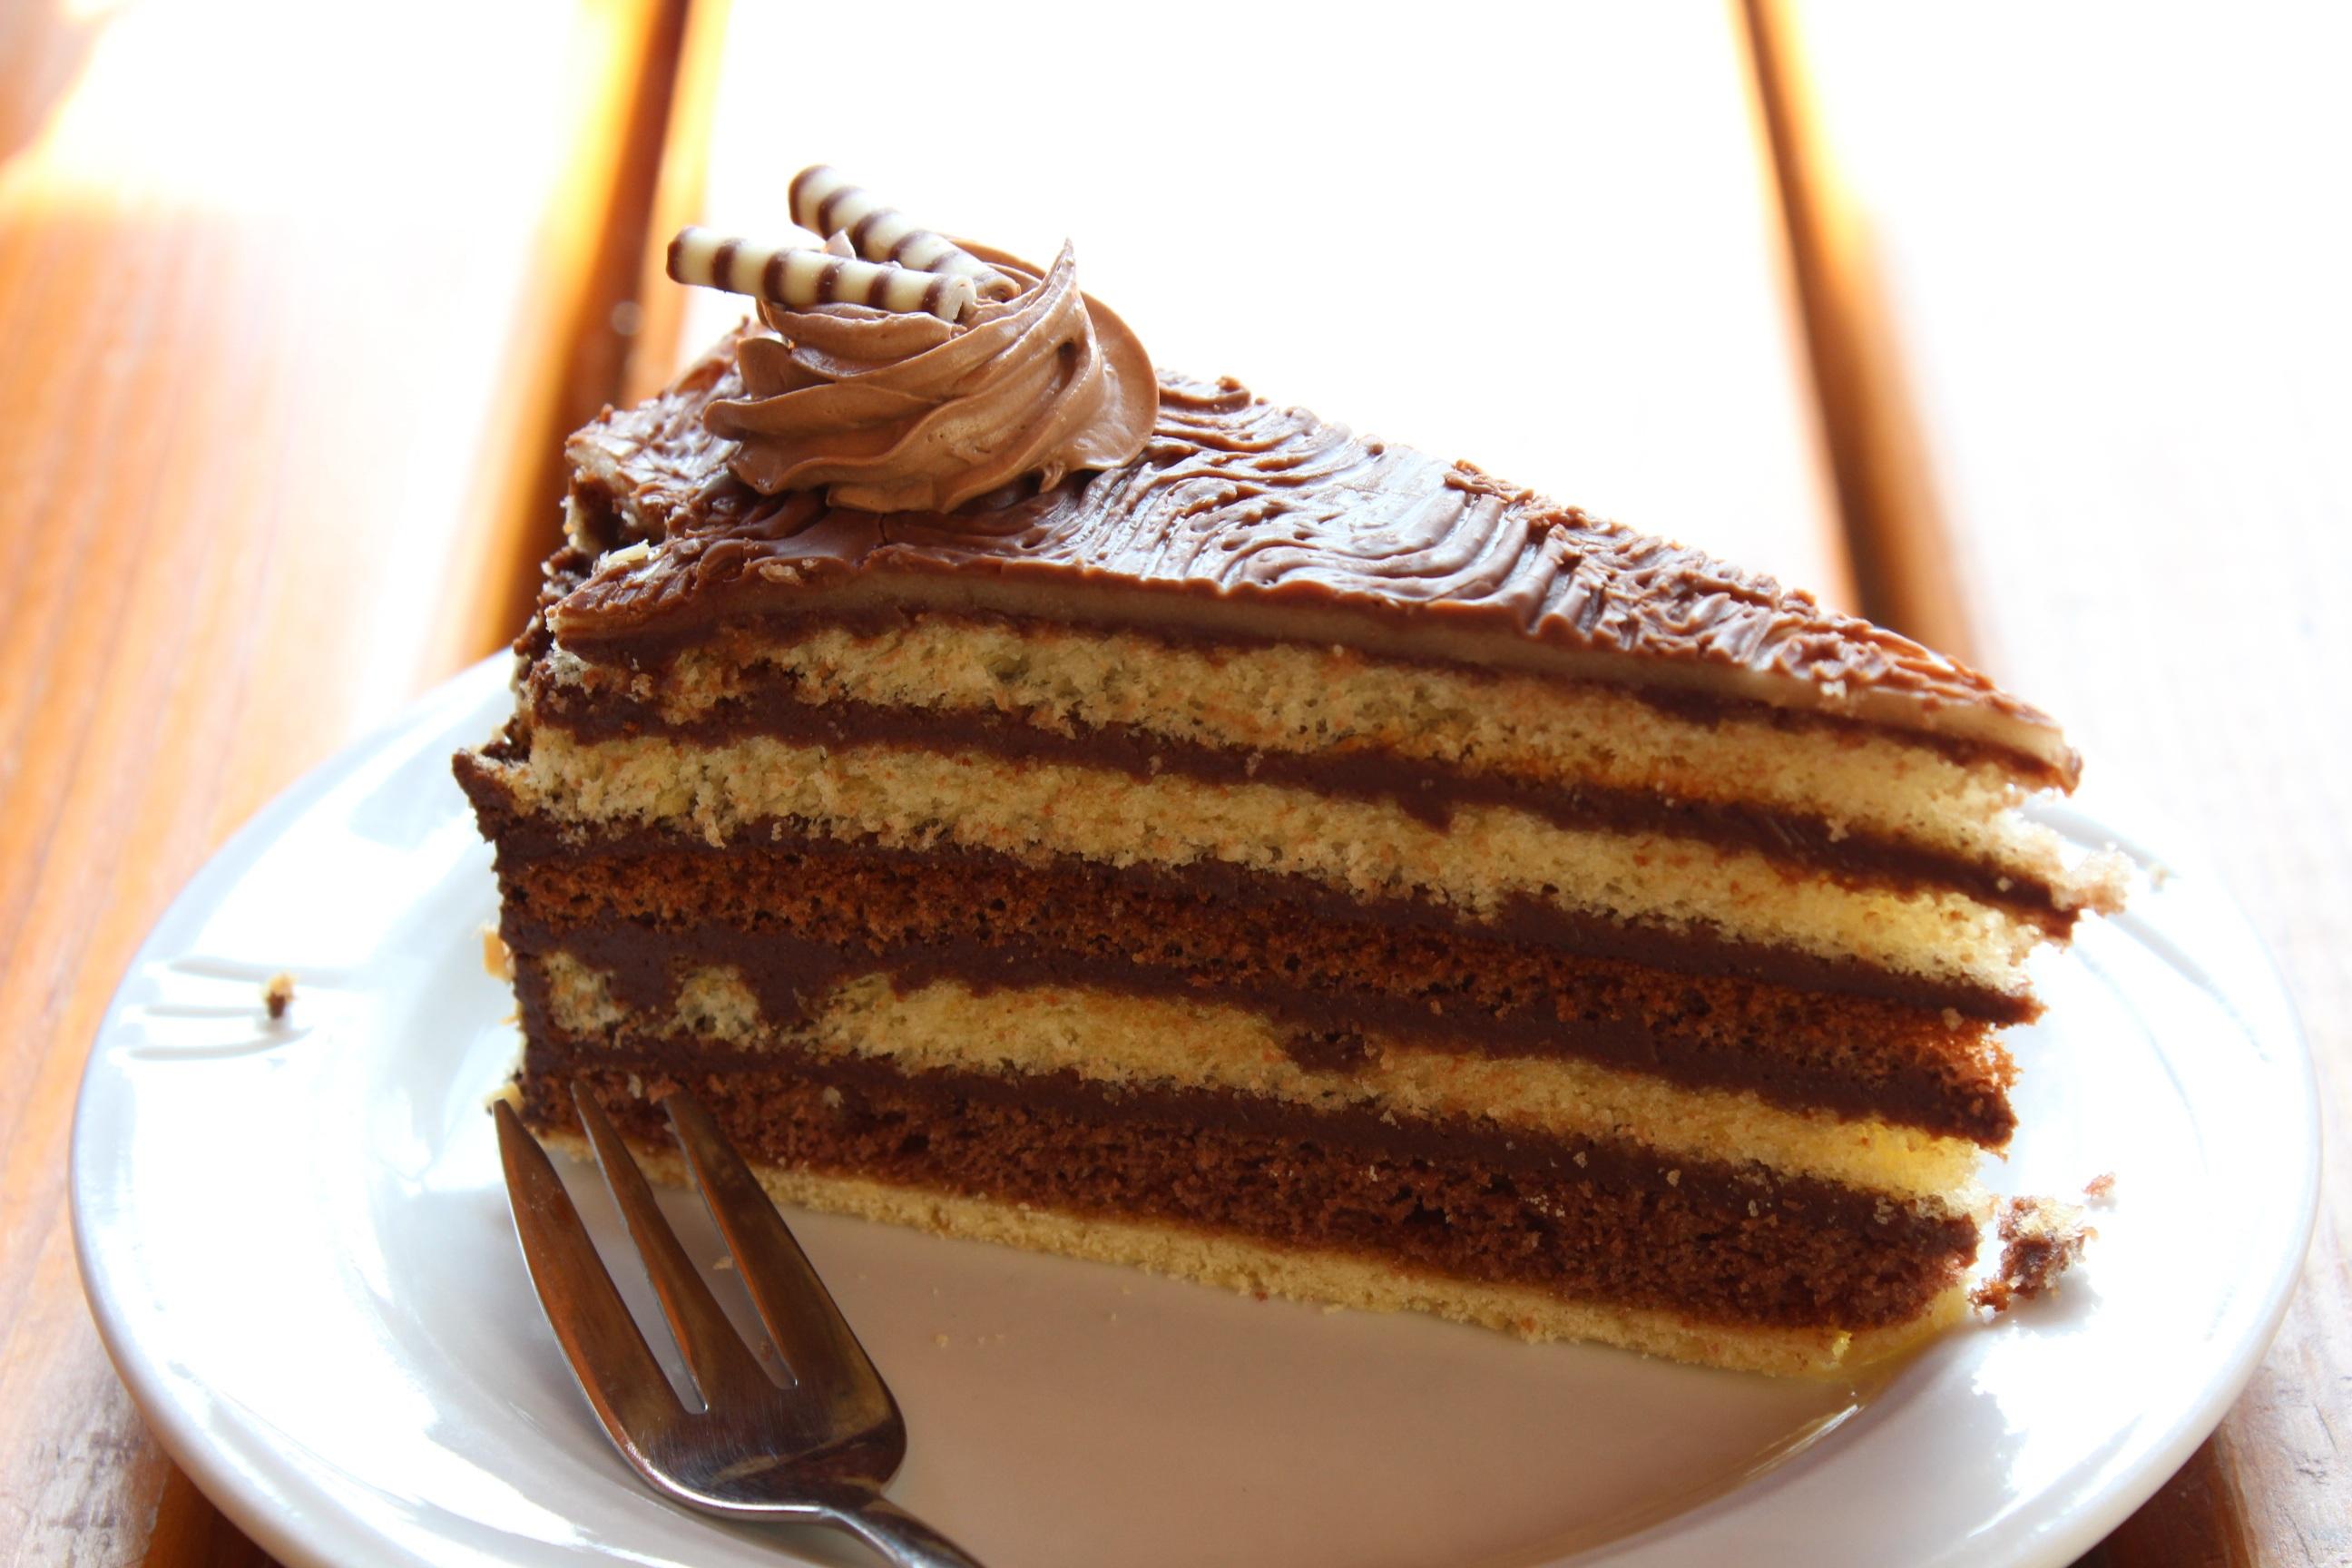 Free Images Dish Food Dessert Cuisine Chocolate Cake